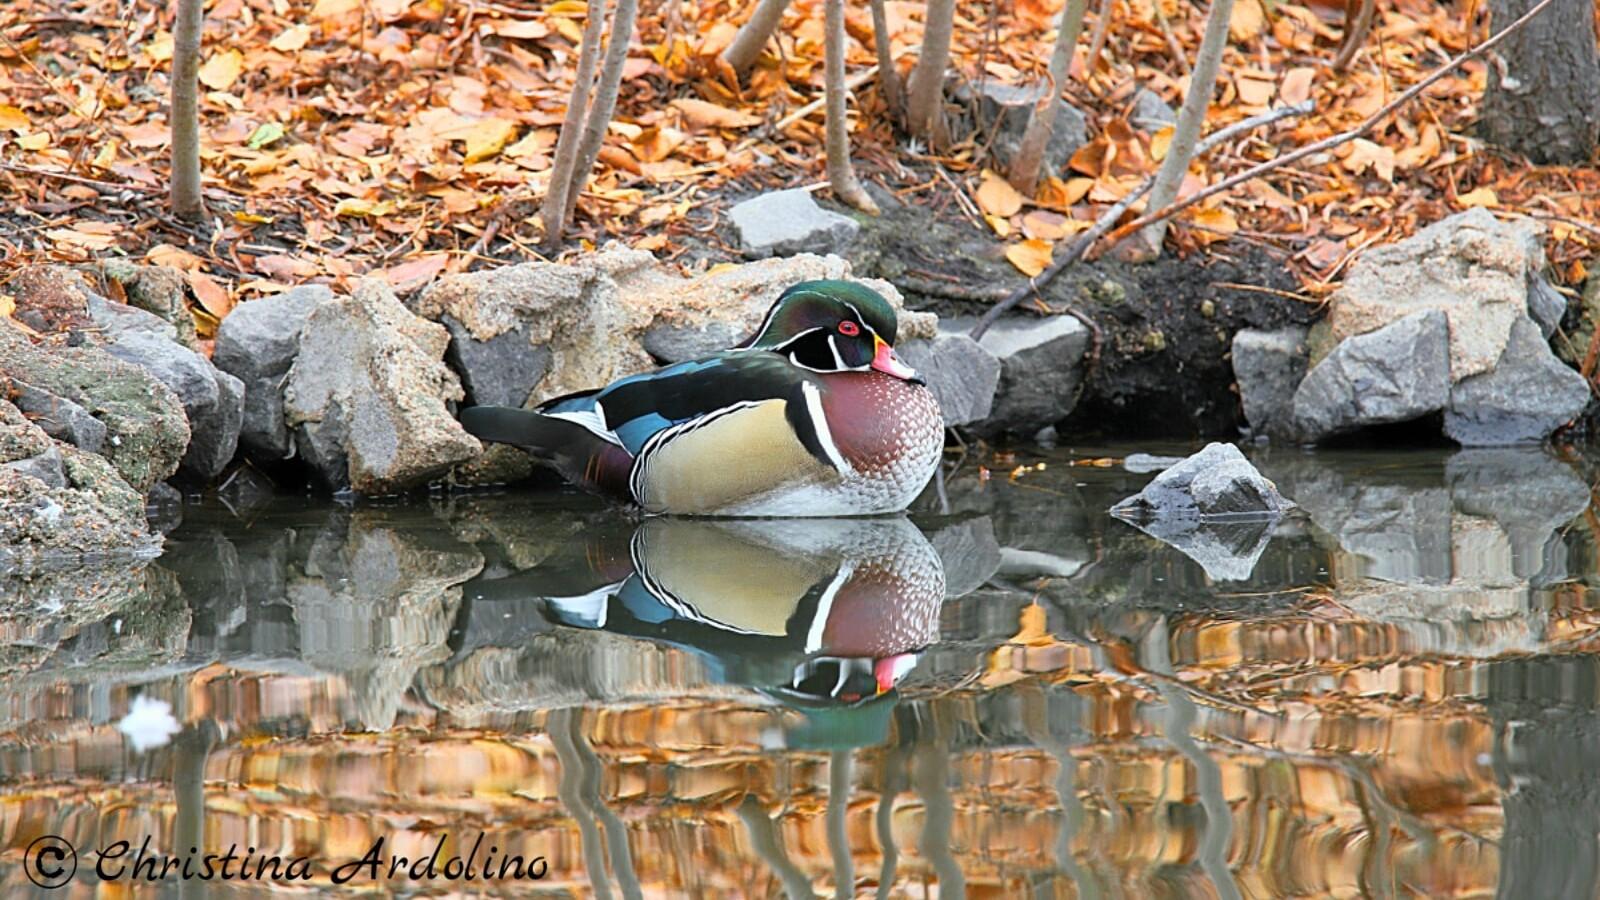 2Male Duck Christina Ardolino.jpg